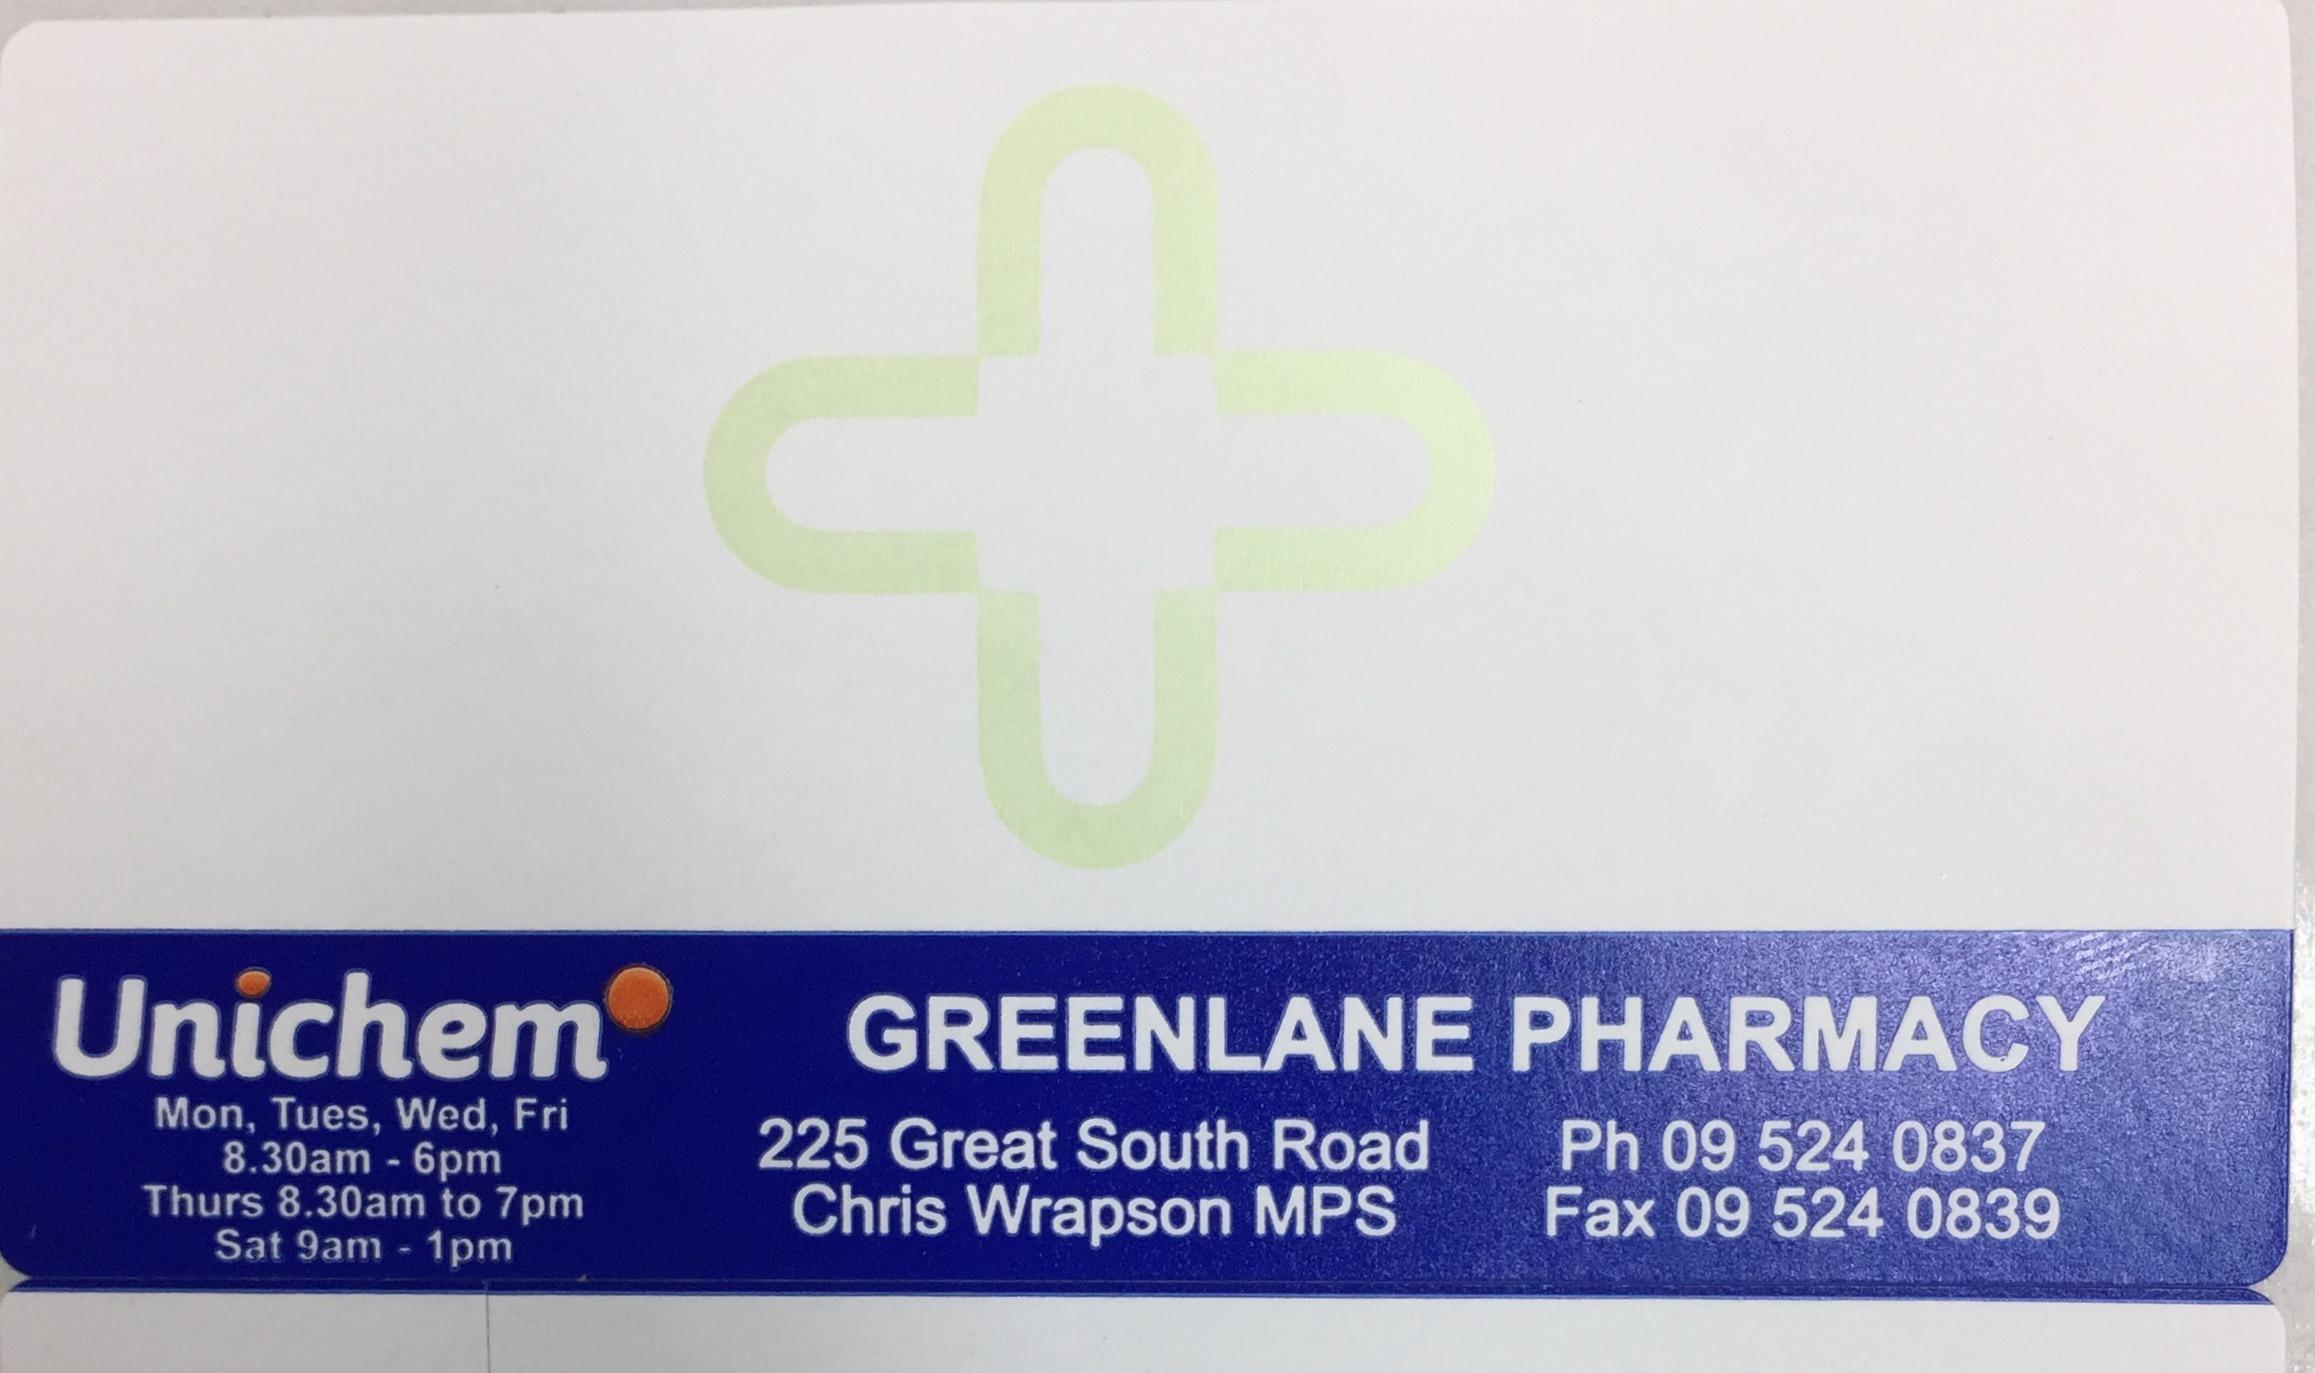 Unichem Greenlane